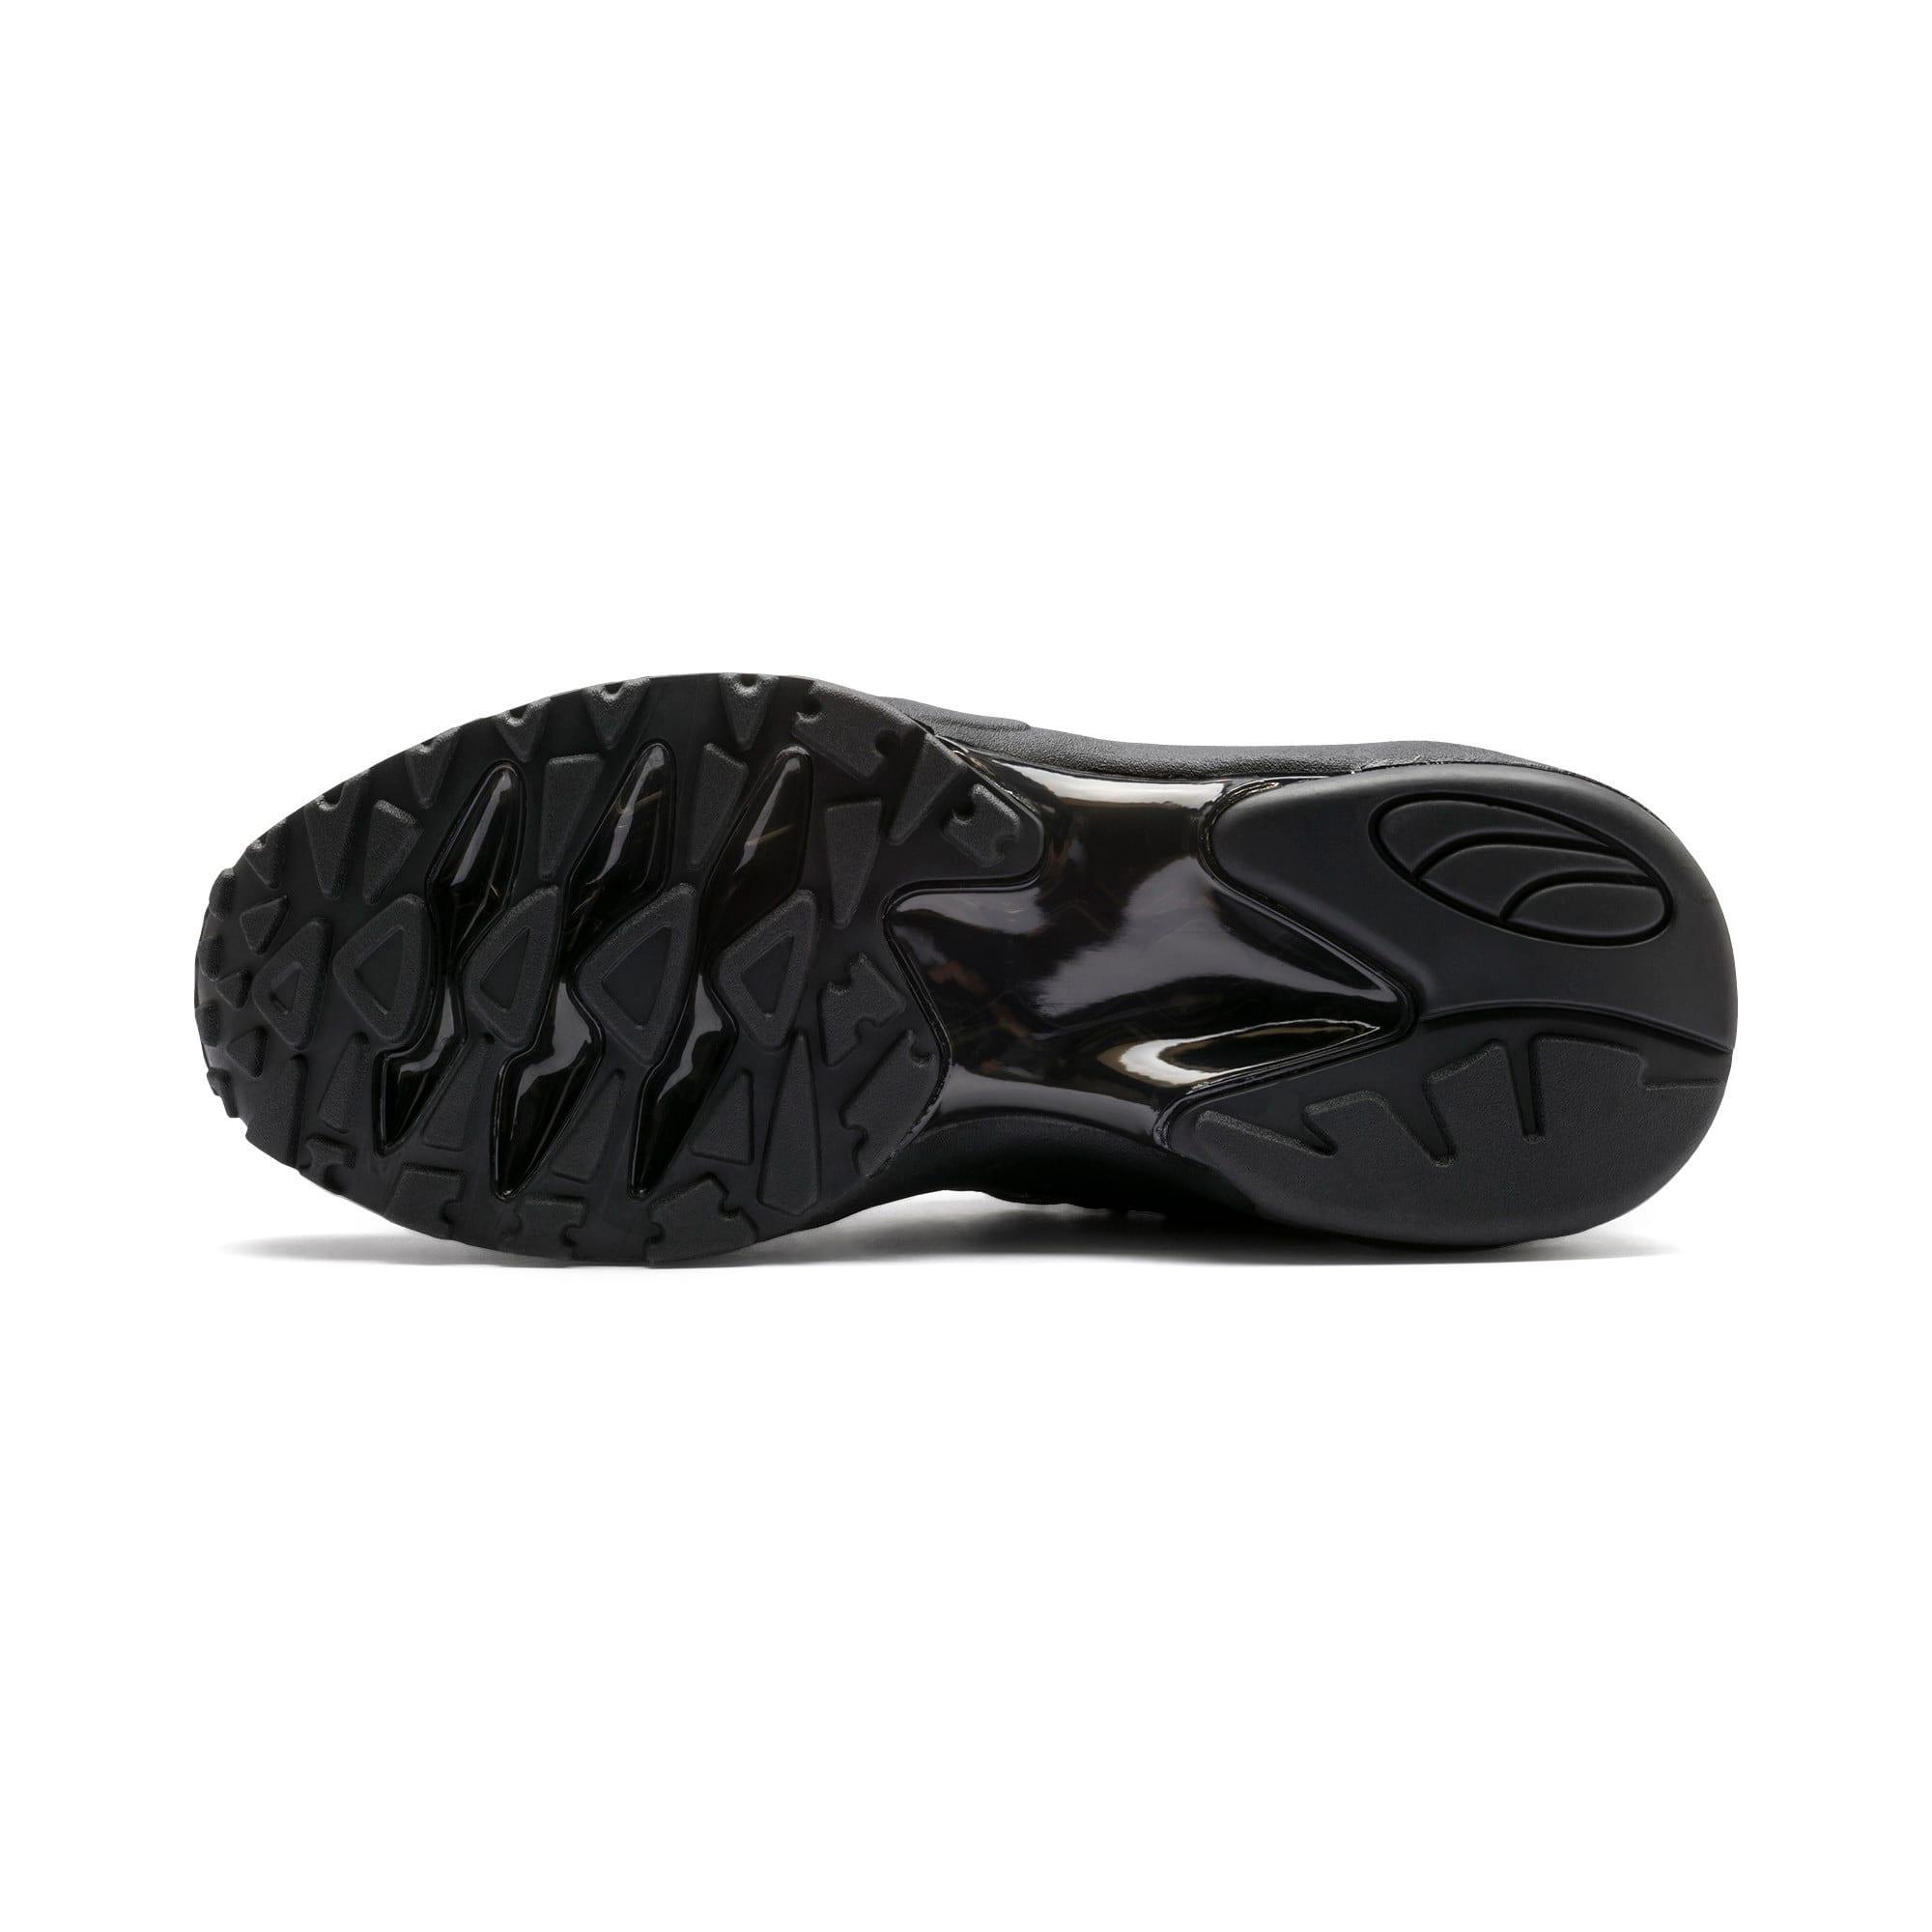 Thumbnail 5 of CELL Endura Rebound Sneakers, Puma Black-Puma Black, medium